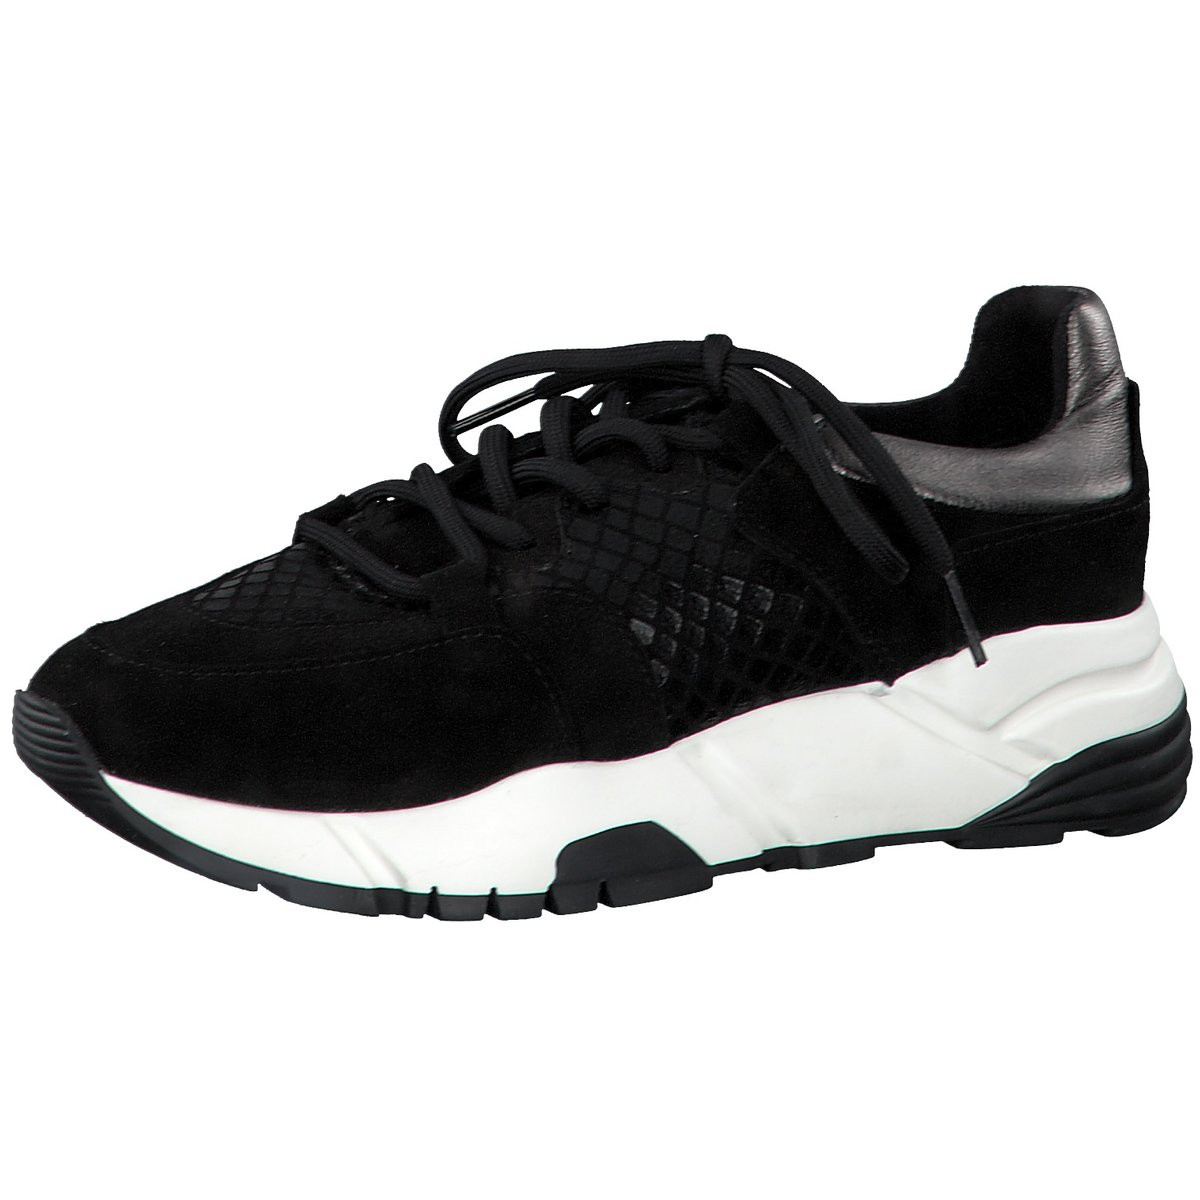 Details zu Tamaris Damen Sneaker 557 1 1 23761 33 098 schwarz 772687